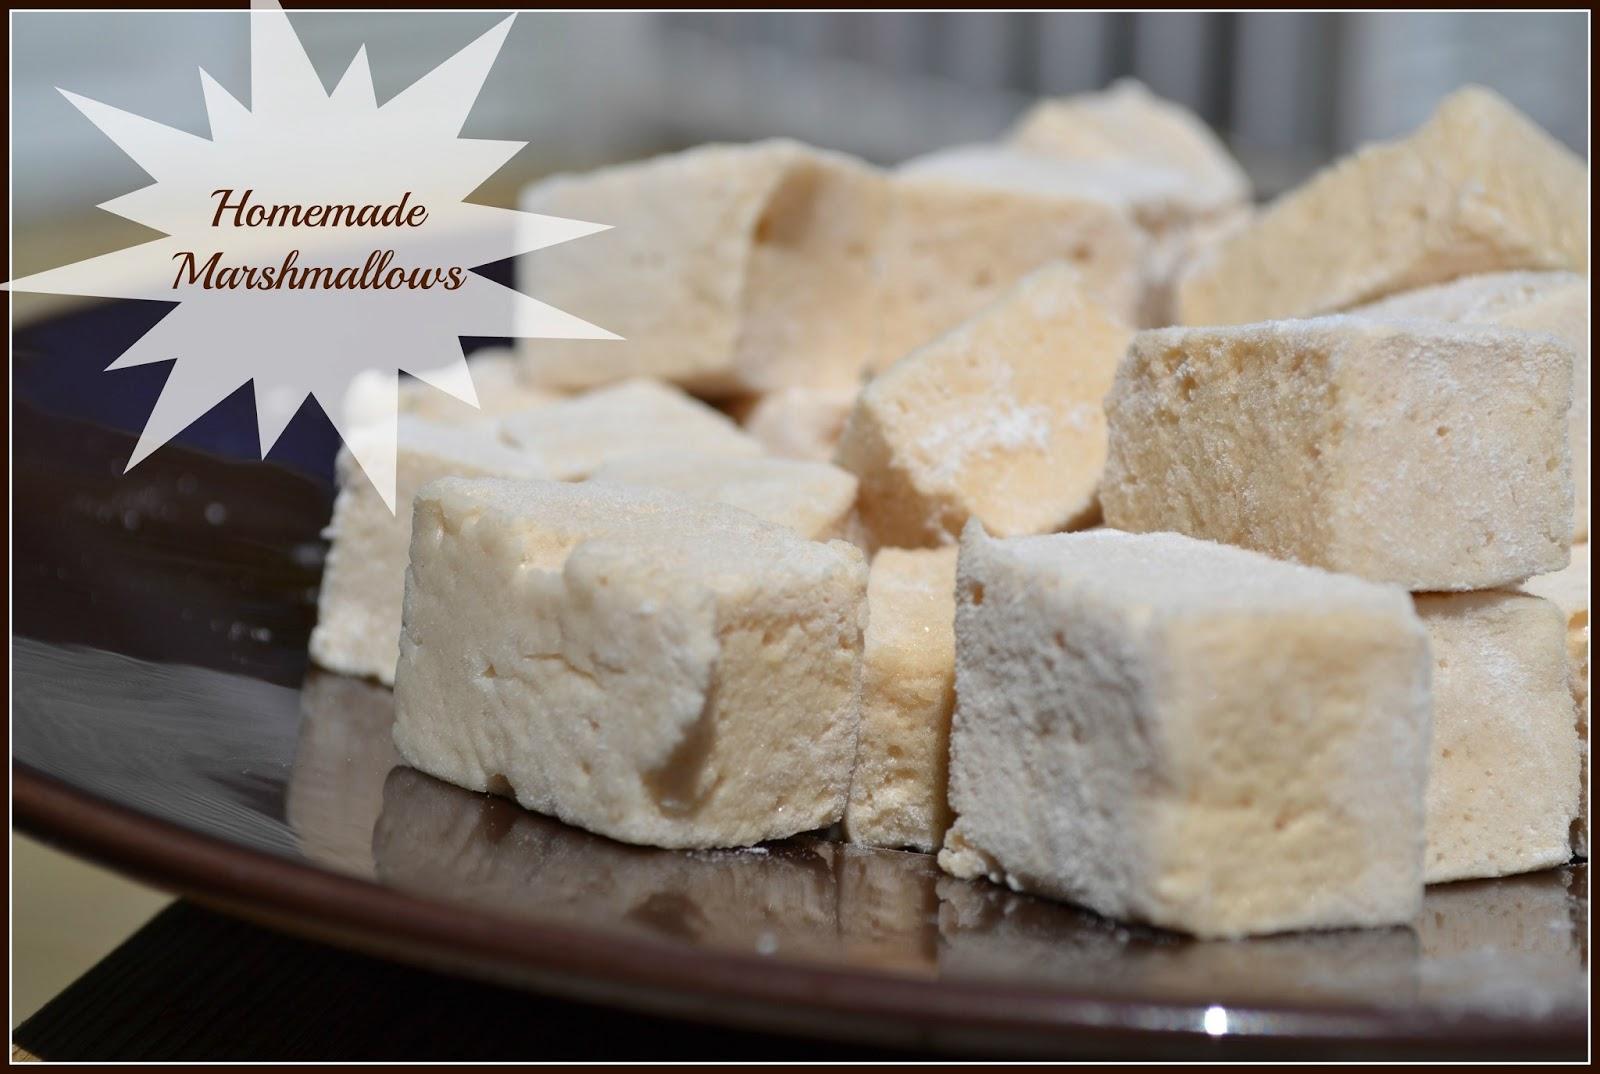 Marshmallows, S'mores Ice Cream, Sea Salt Caramel Ice Cream and ...